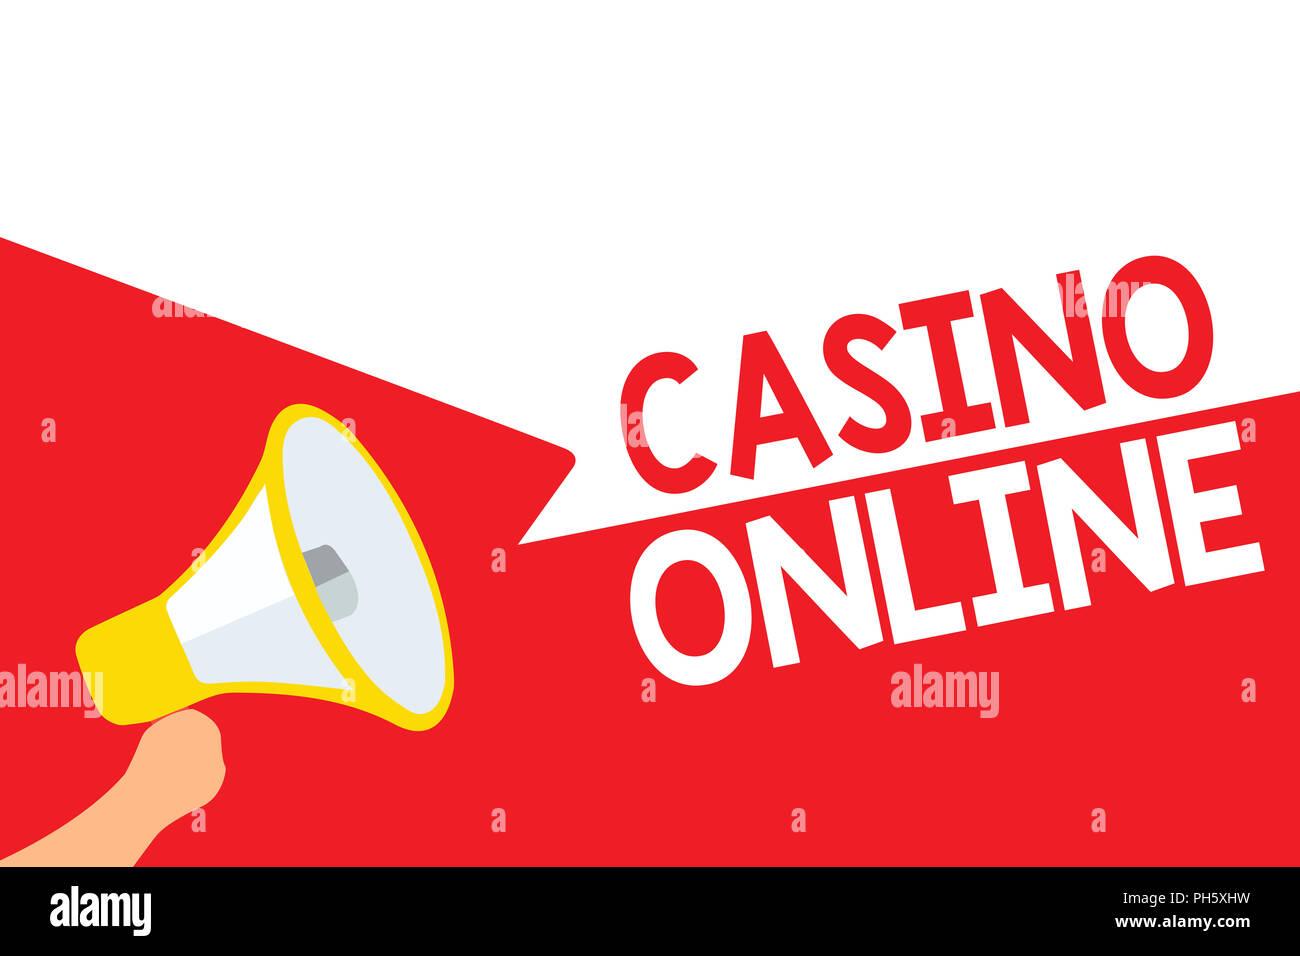 company casino online